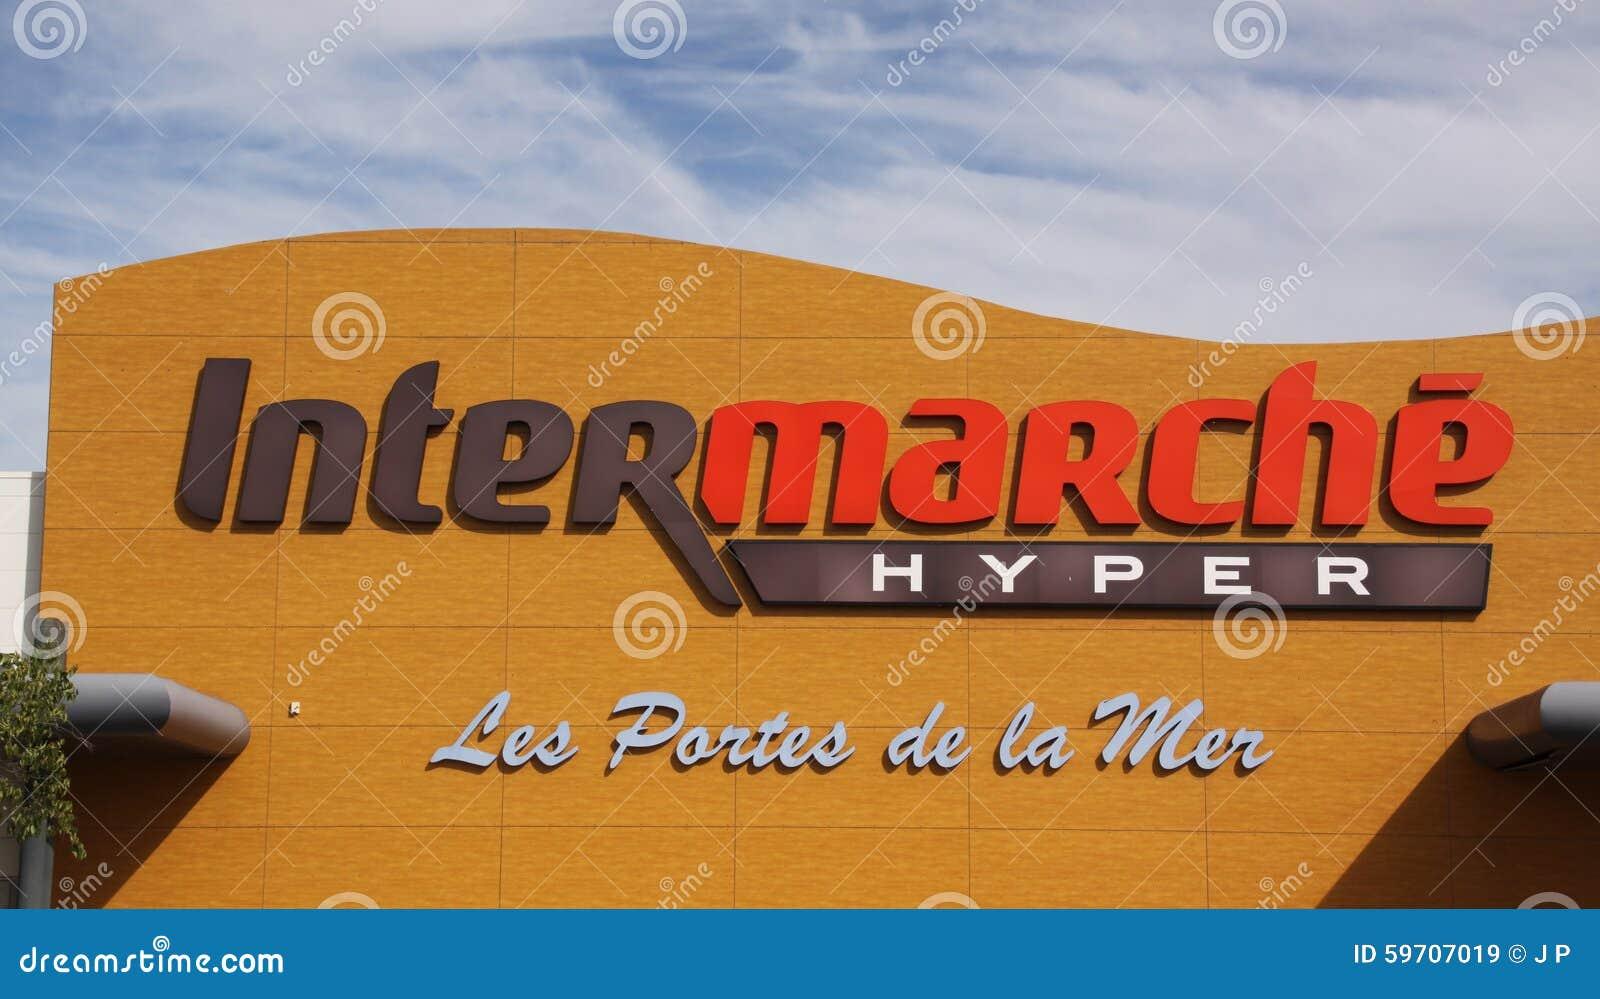 Intermarche Is A European Supermarket Chain Editorial Stock Image